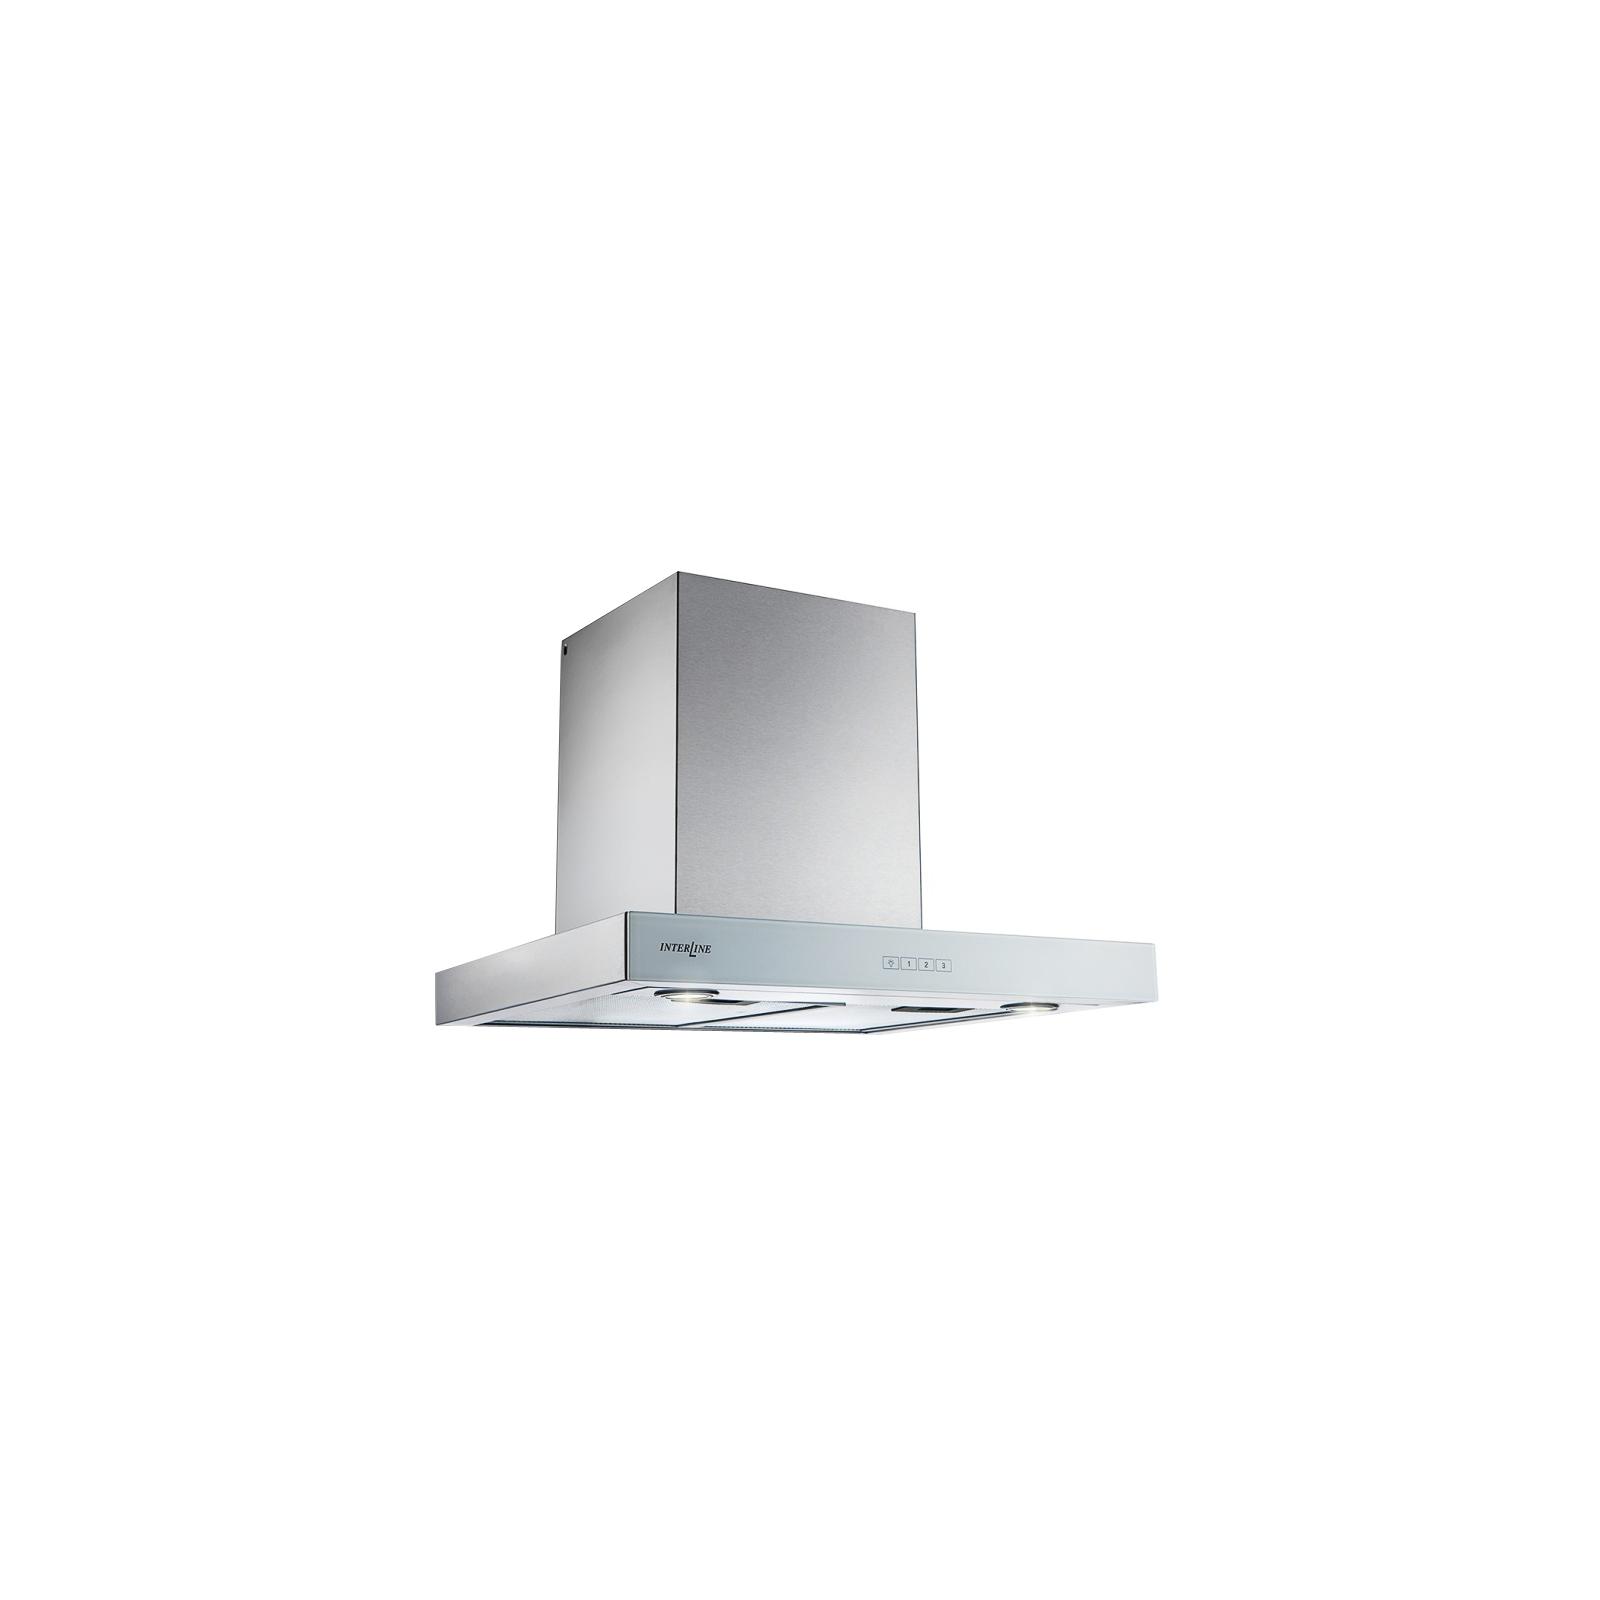 Вытяжка кухонная Interline COLLIDER X/V/W 60 E.S.